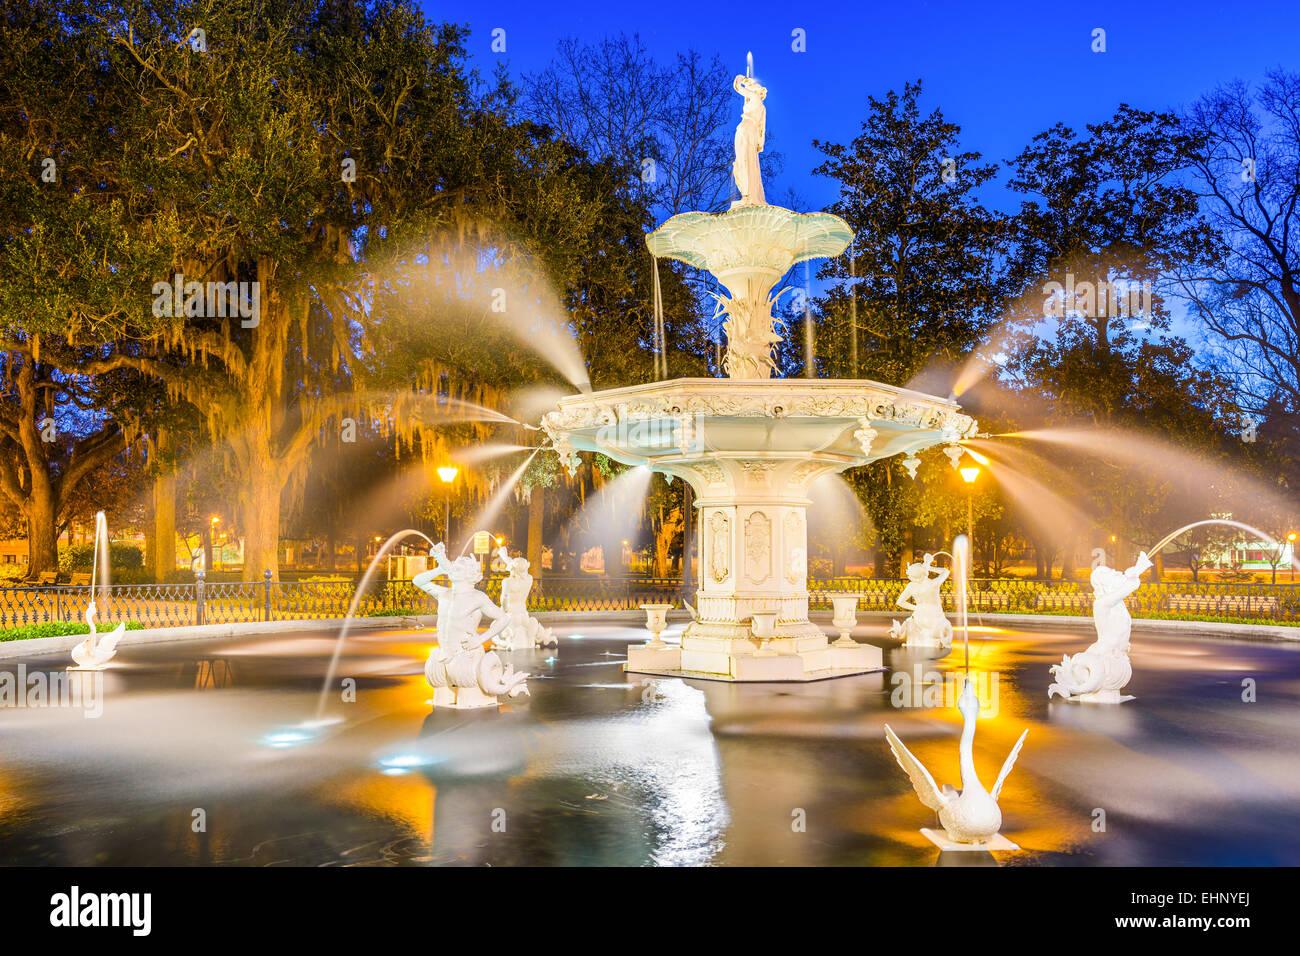 Savannah, Georgia, USA at Forsyth Park fountain. - Stock Image